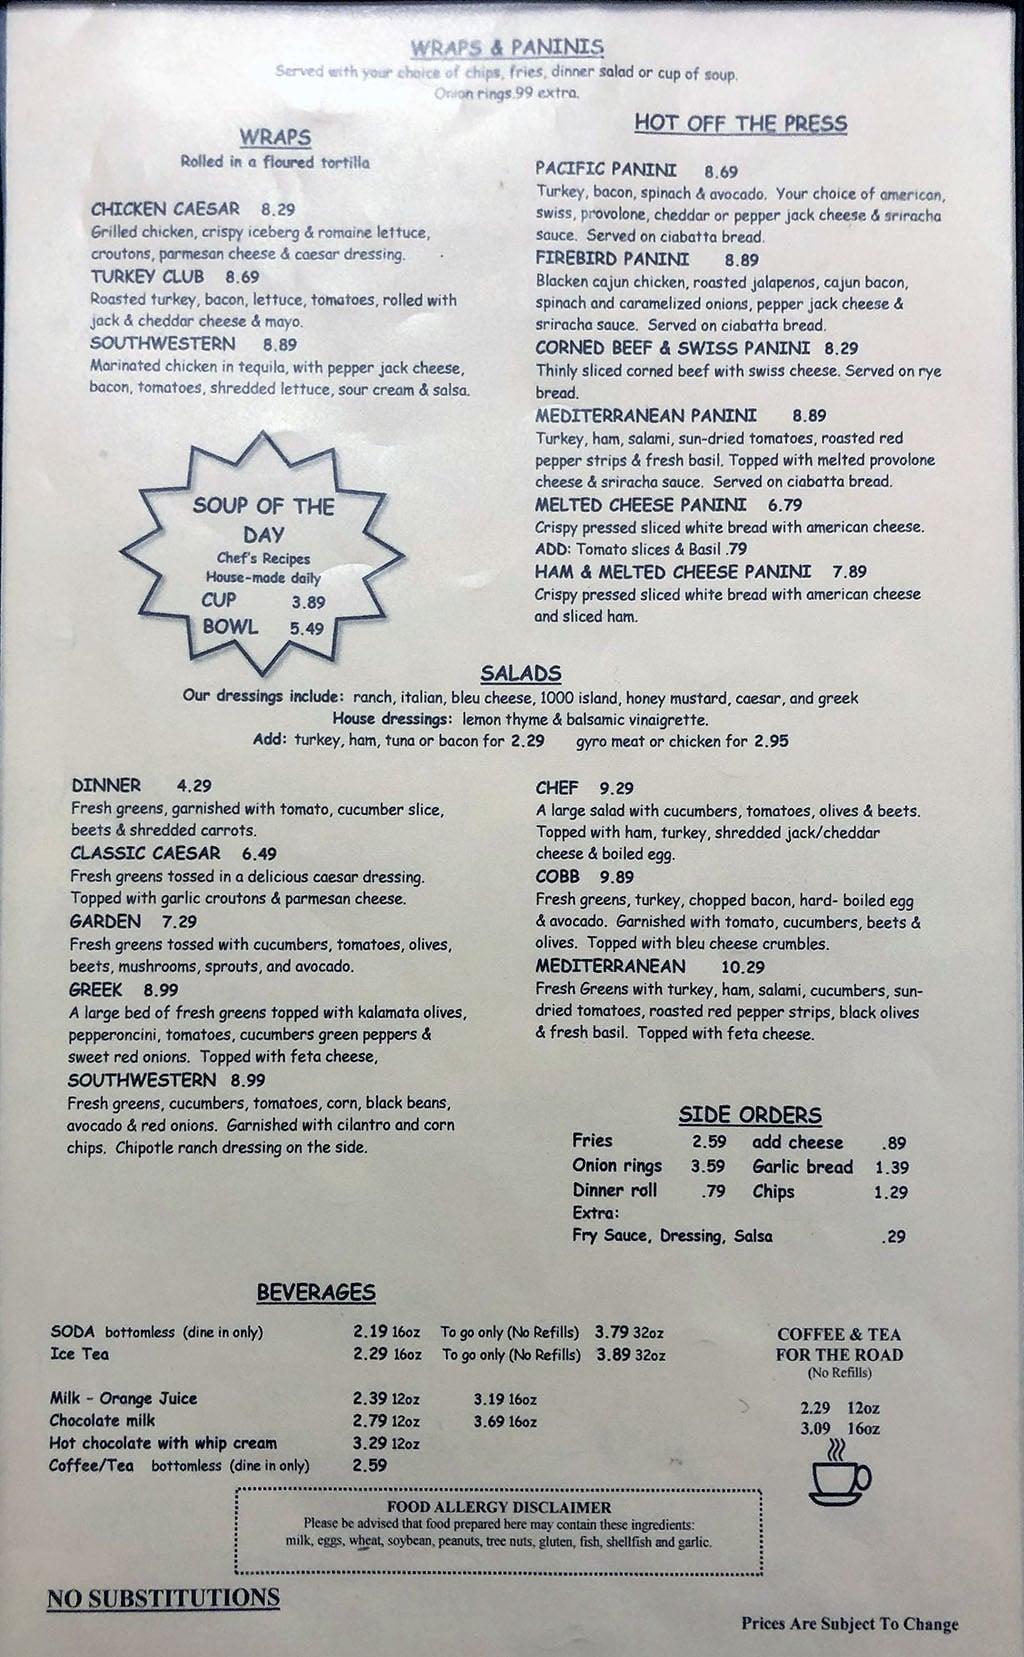 Roberts Restaurant & Deli menu - page two